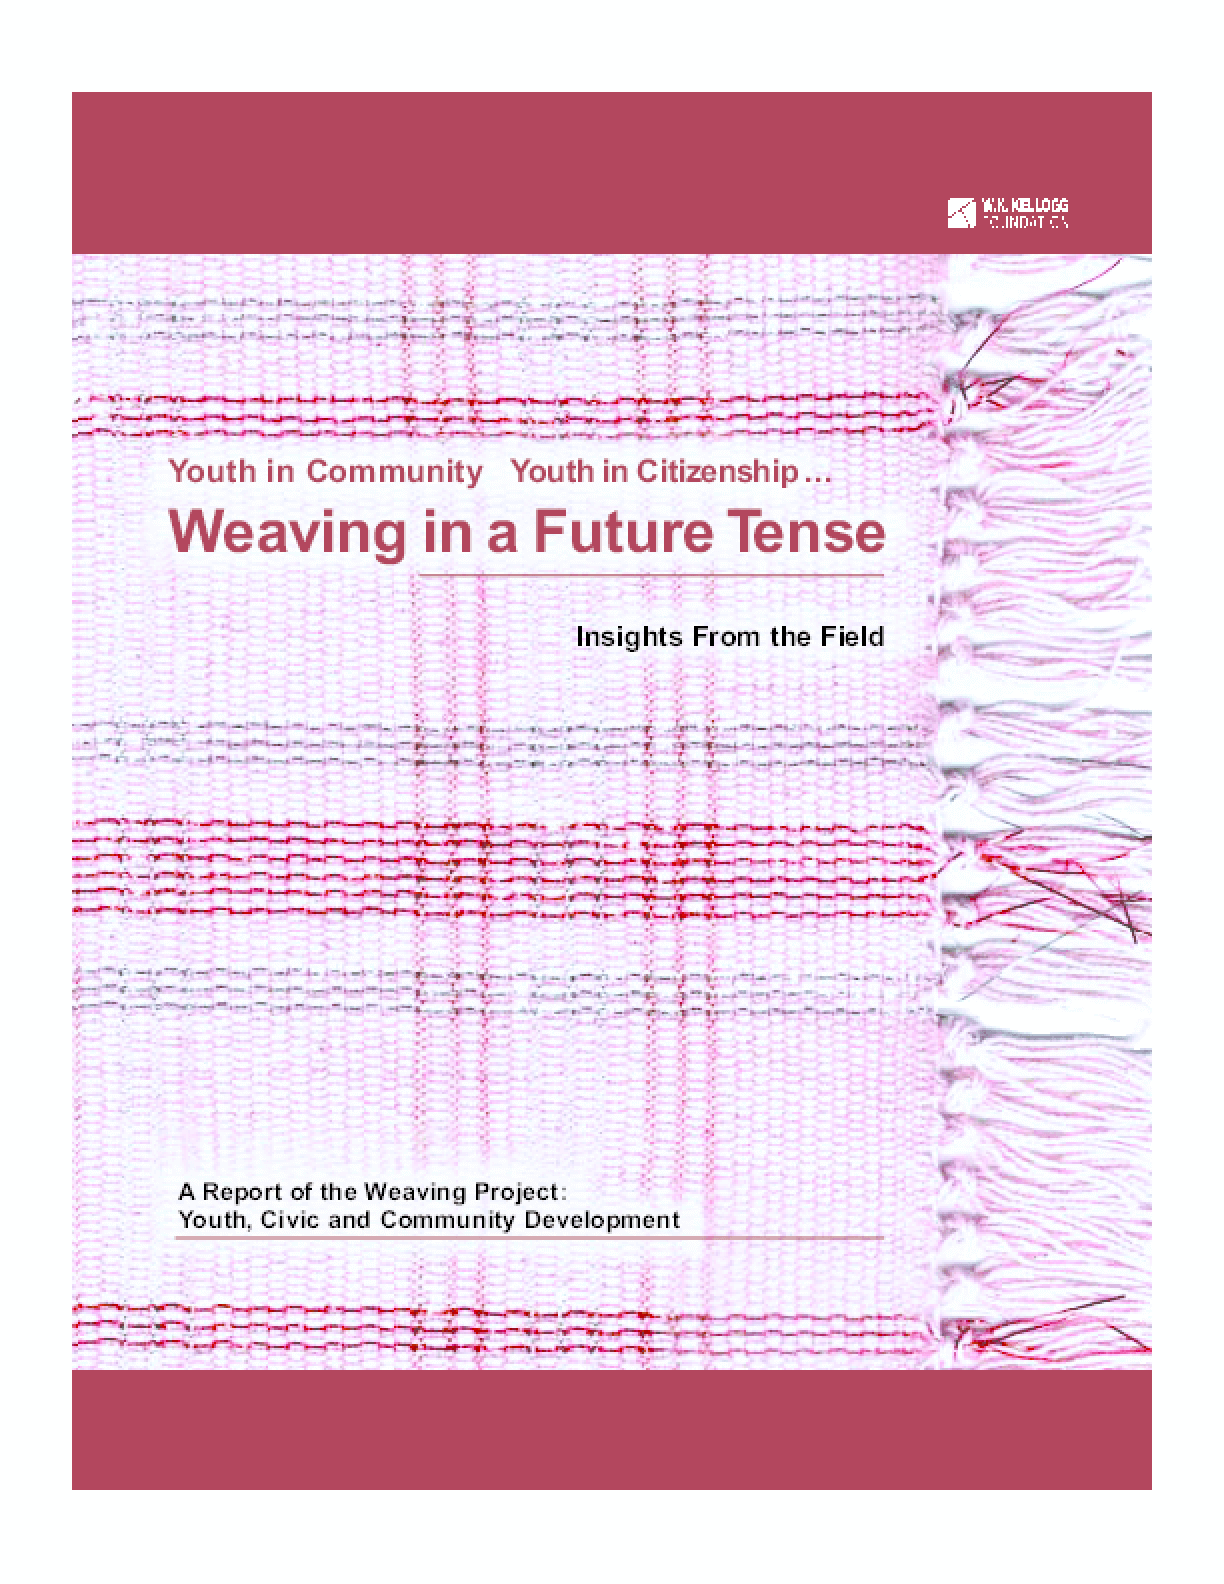 Weaving in a Future Tense